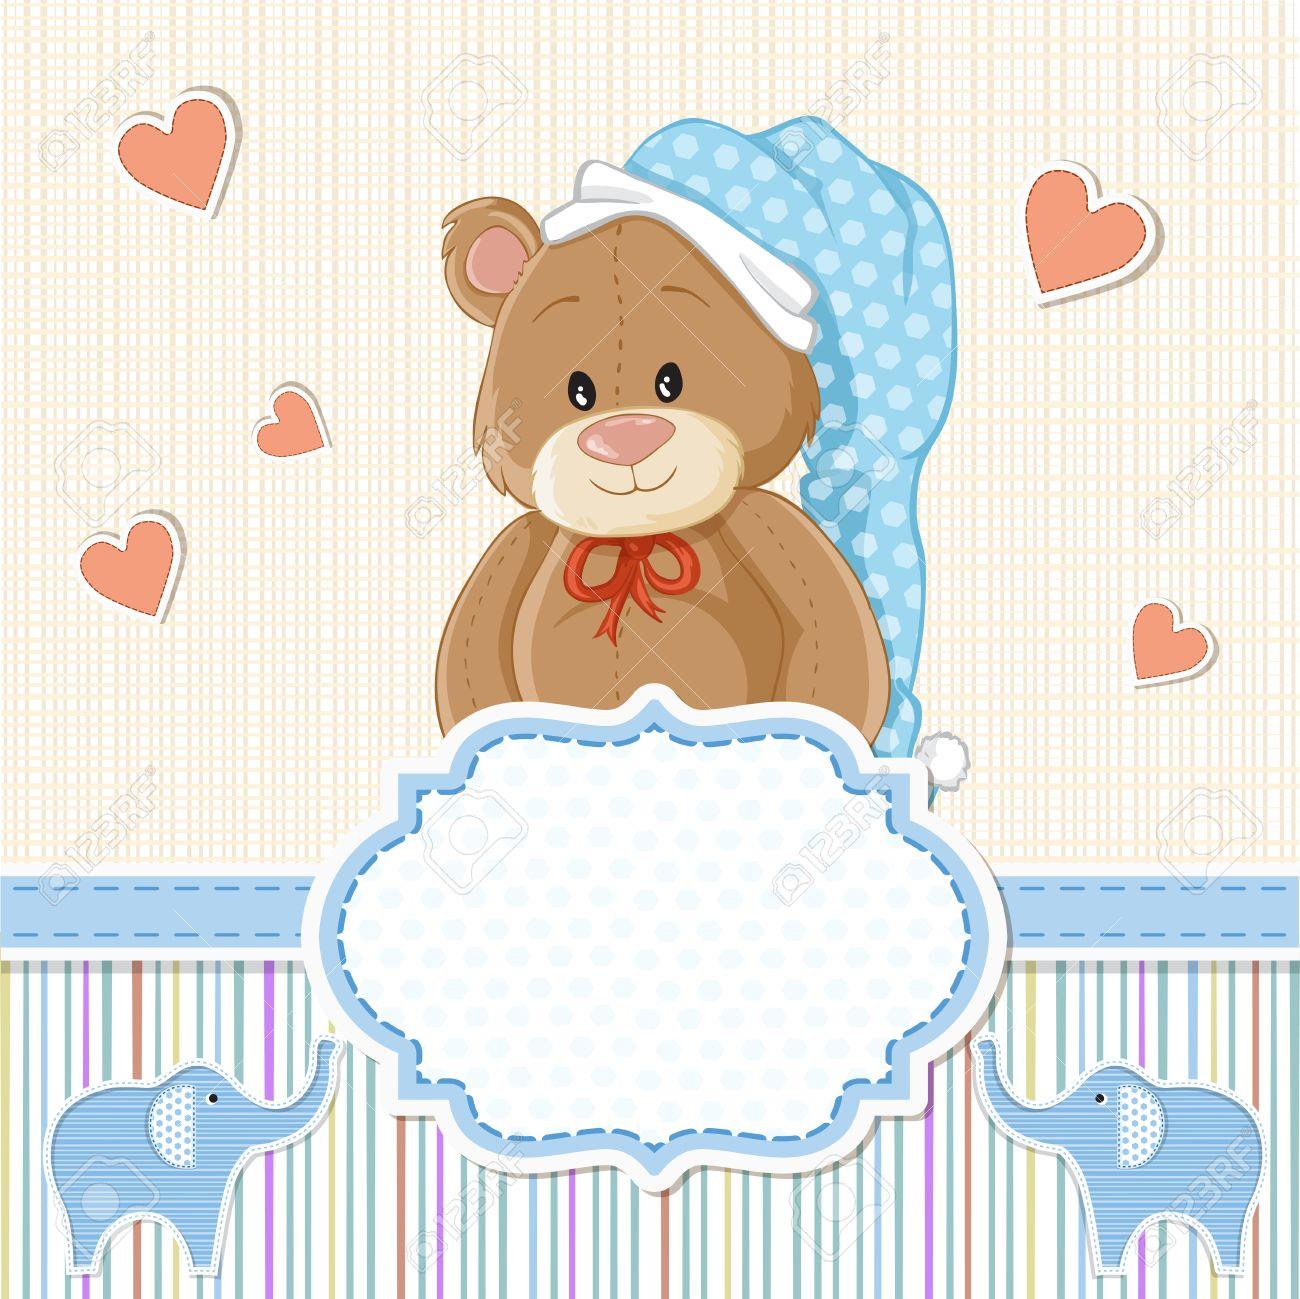 Teddy Bear For Baby Boy Baby Shower Invitation